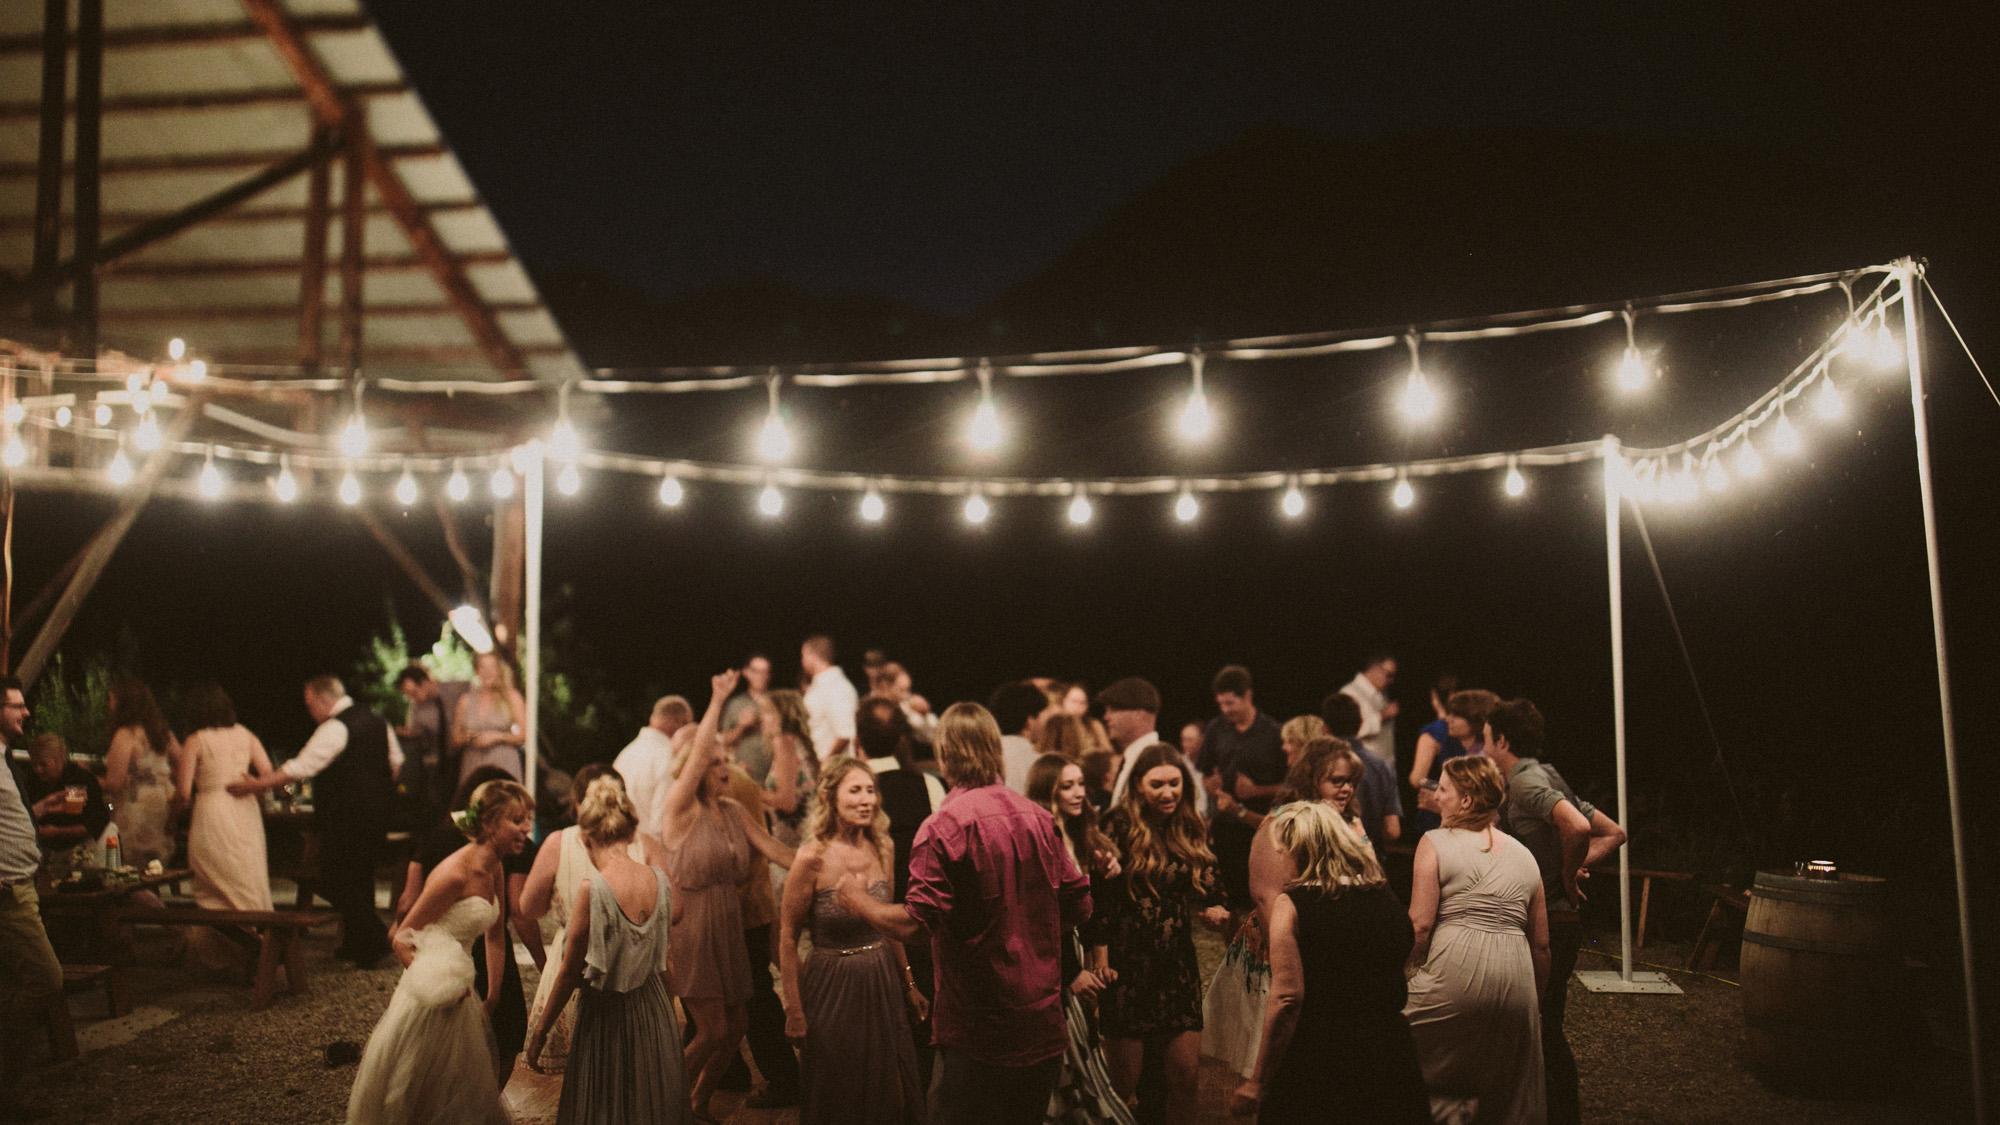 Montana_Wedding_Photos_alec_vanderboom-0147.jpg